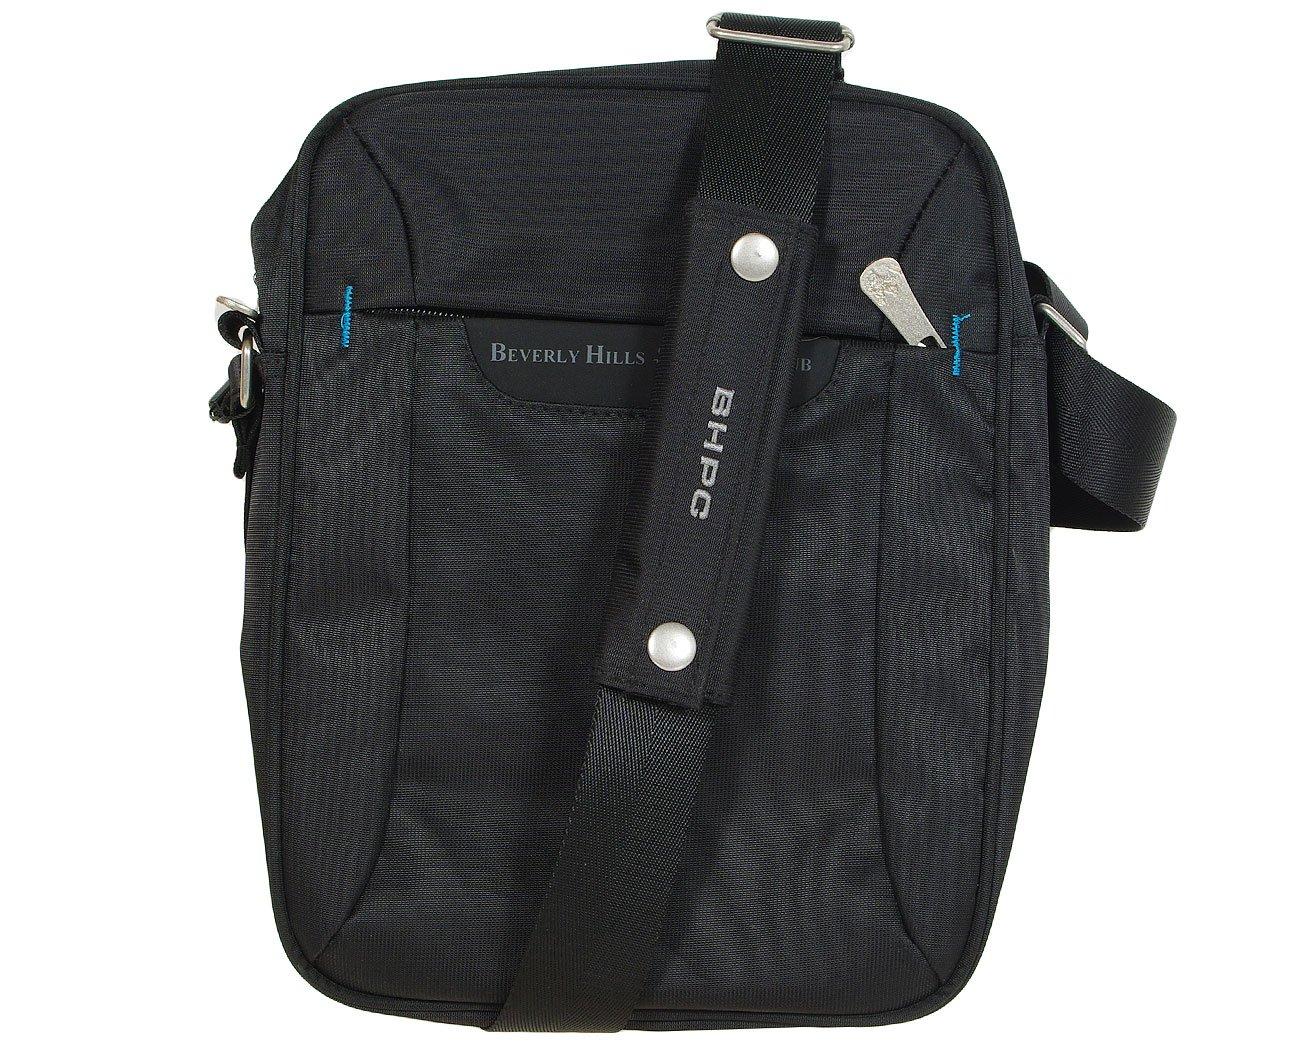 Beverly Hills Polo Club Detroit torba na ramię nero